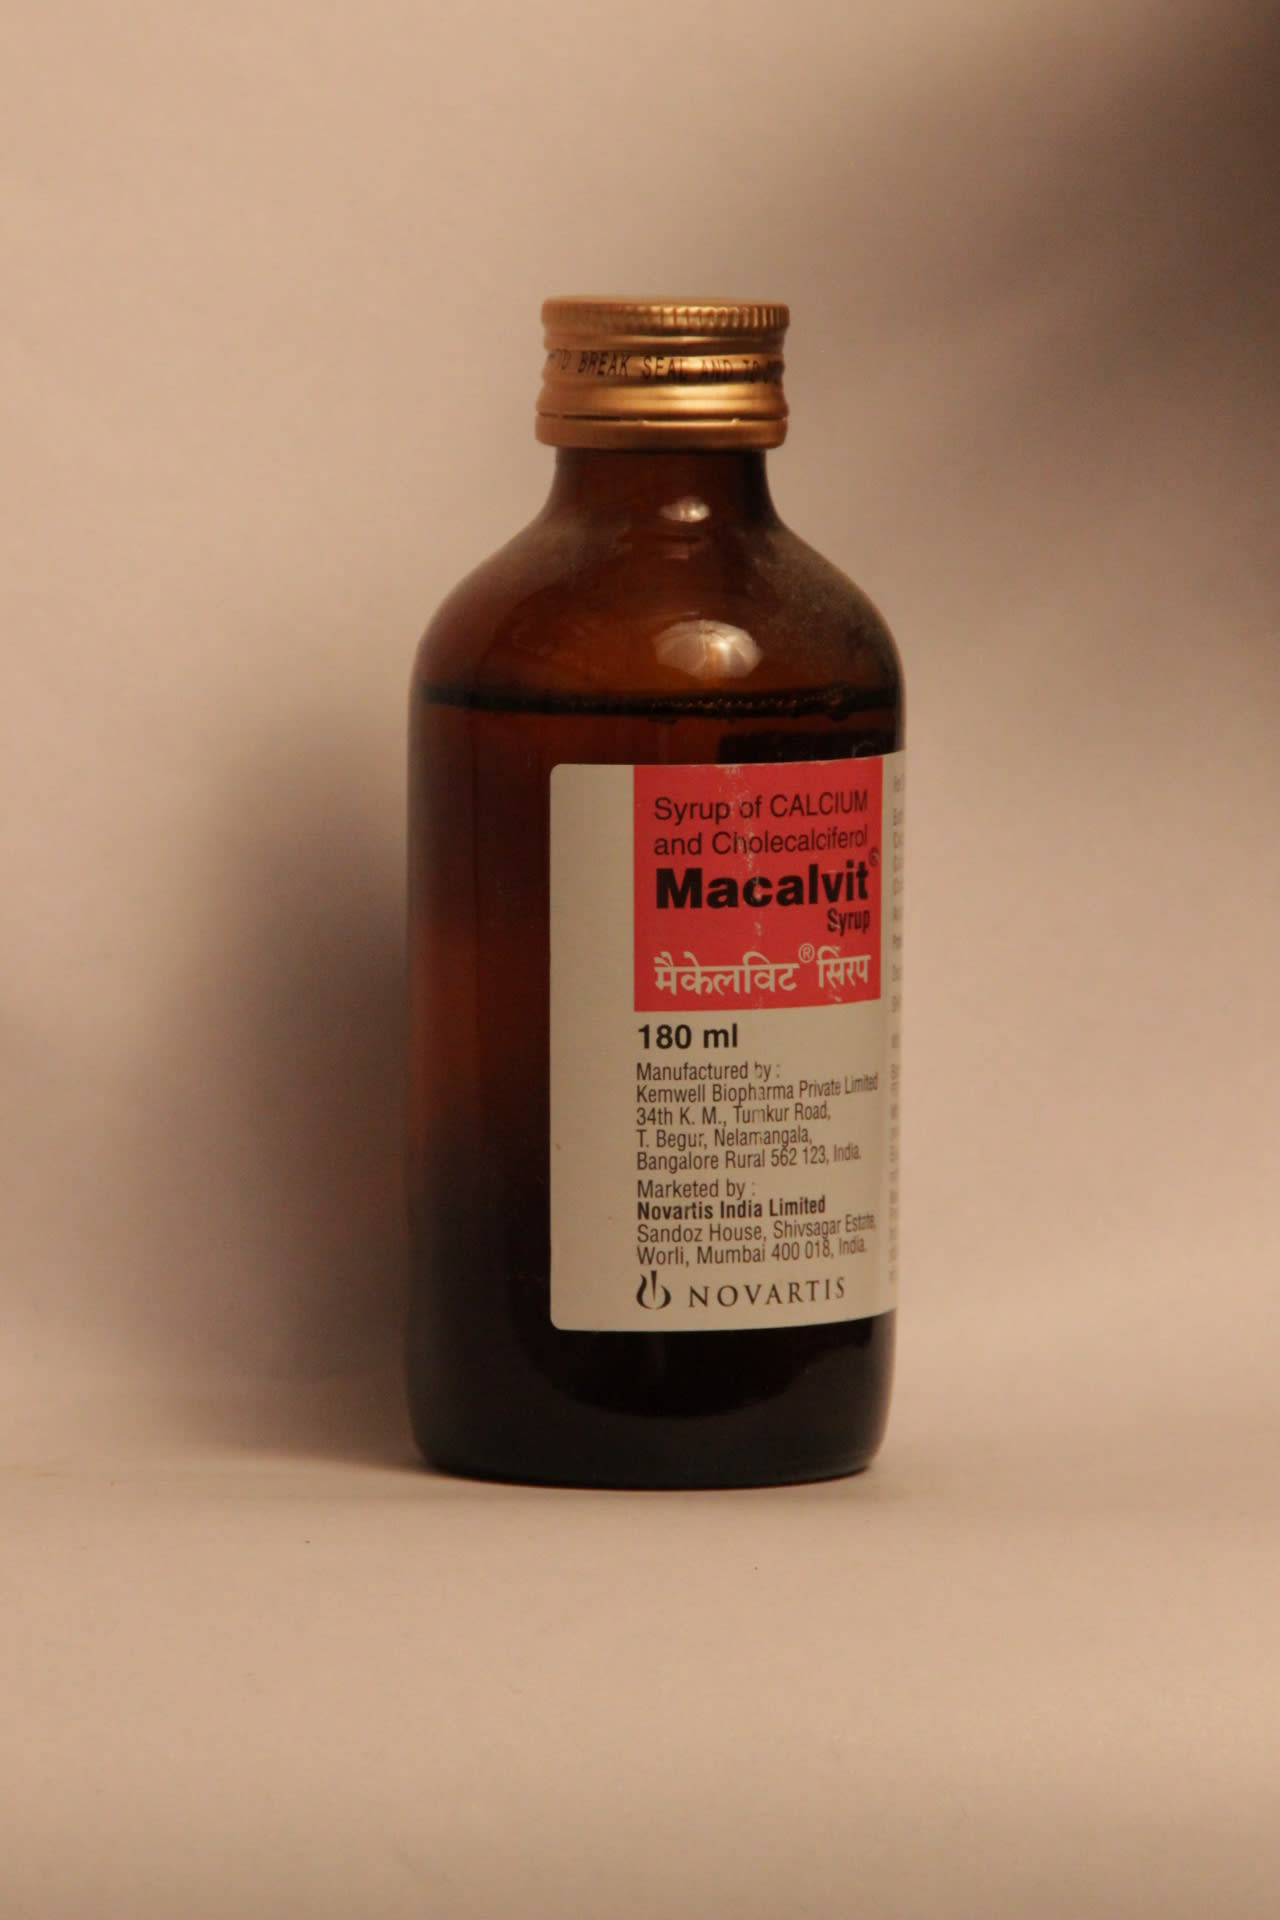 Macalvit Syrup